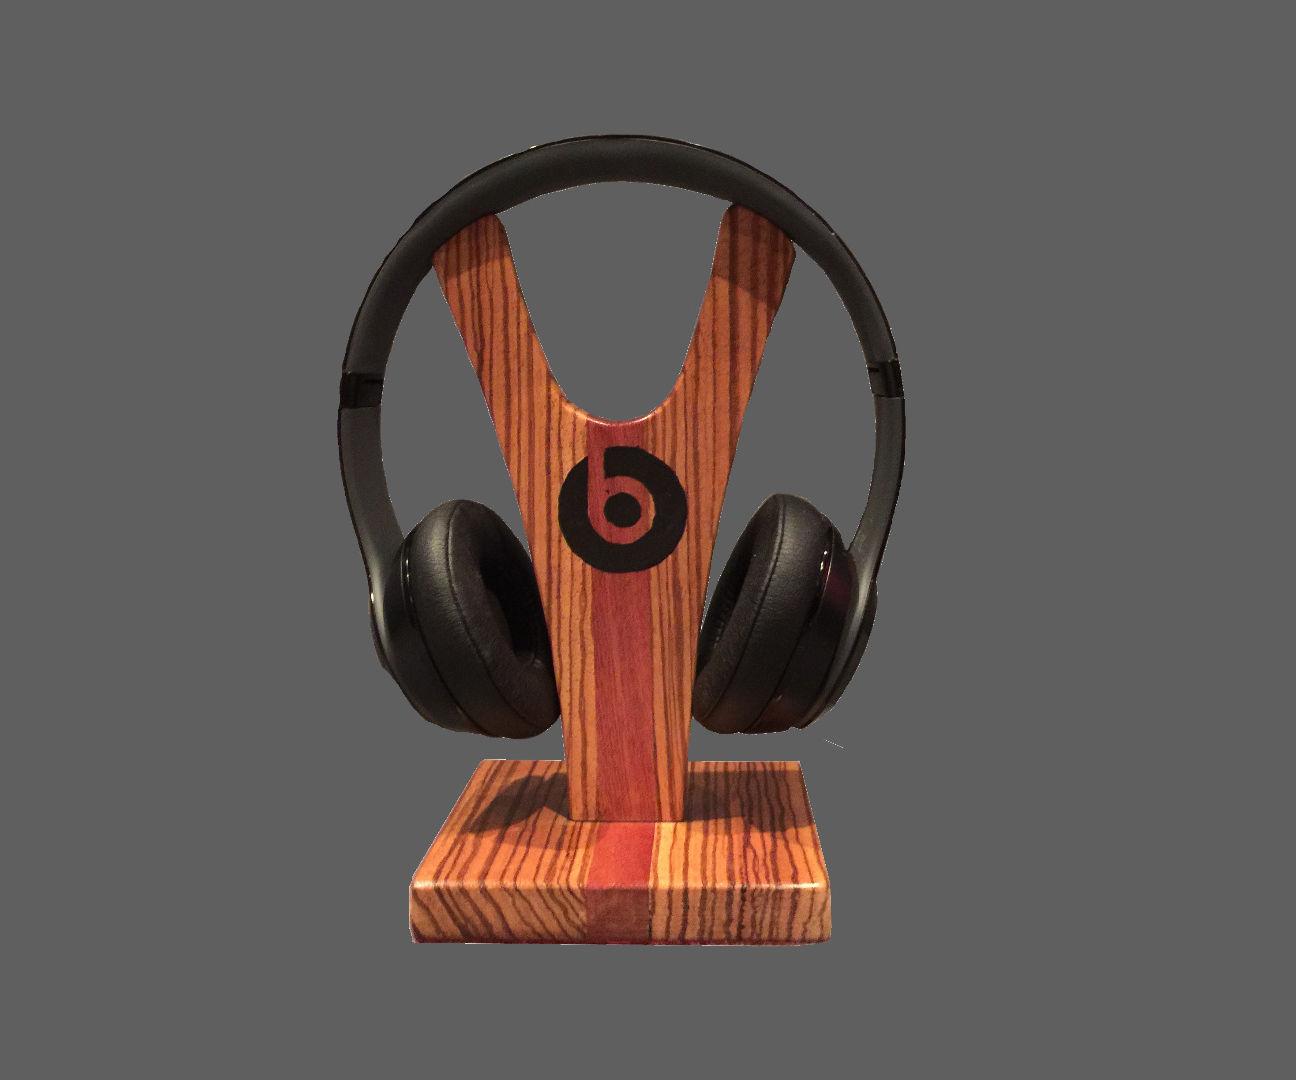 Wooden Headphone Stand For My Beats Headphones